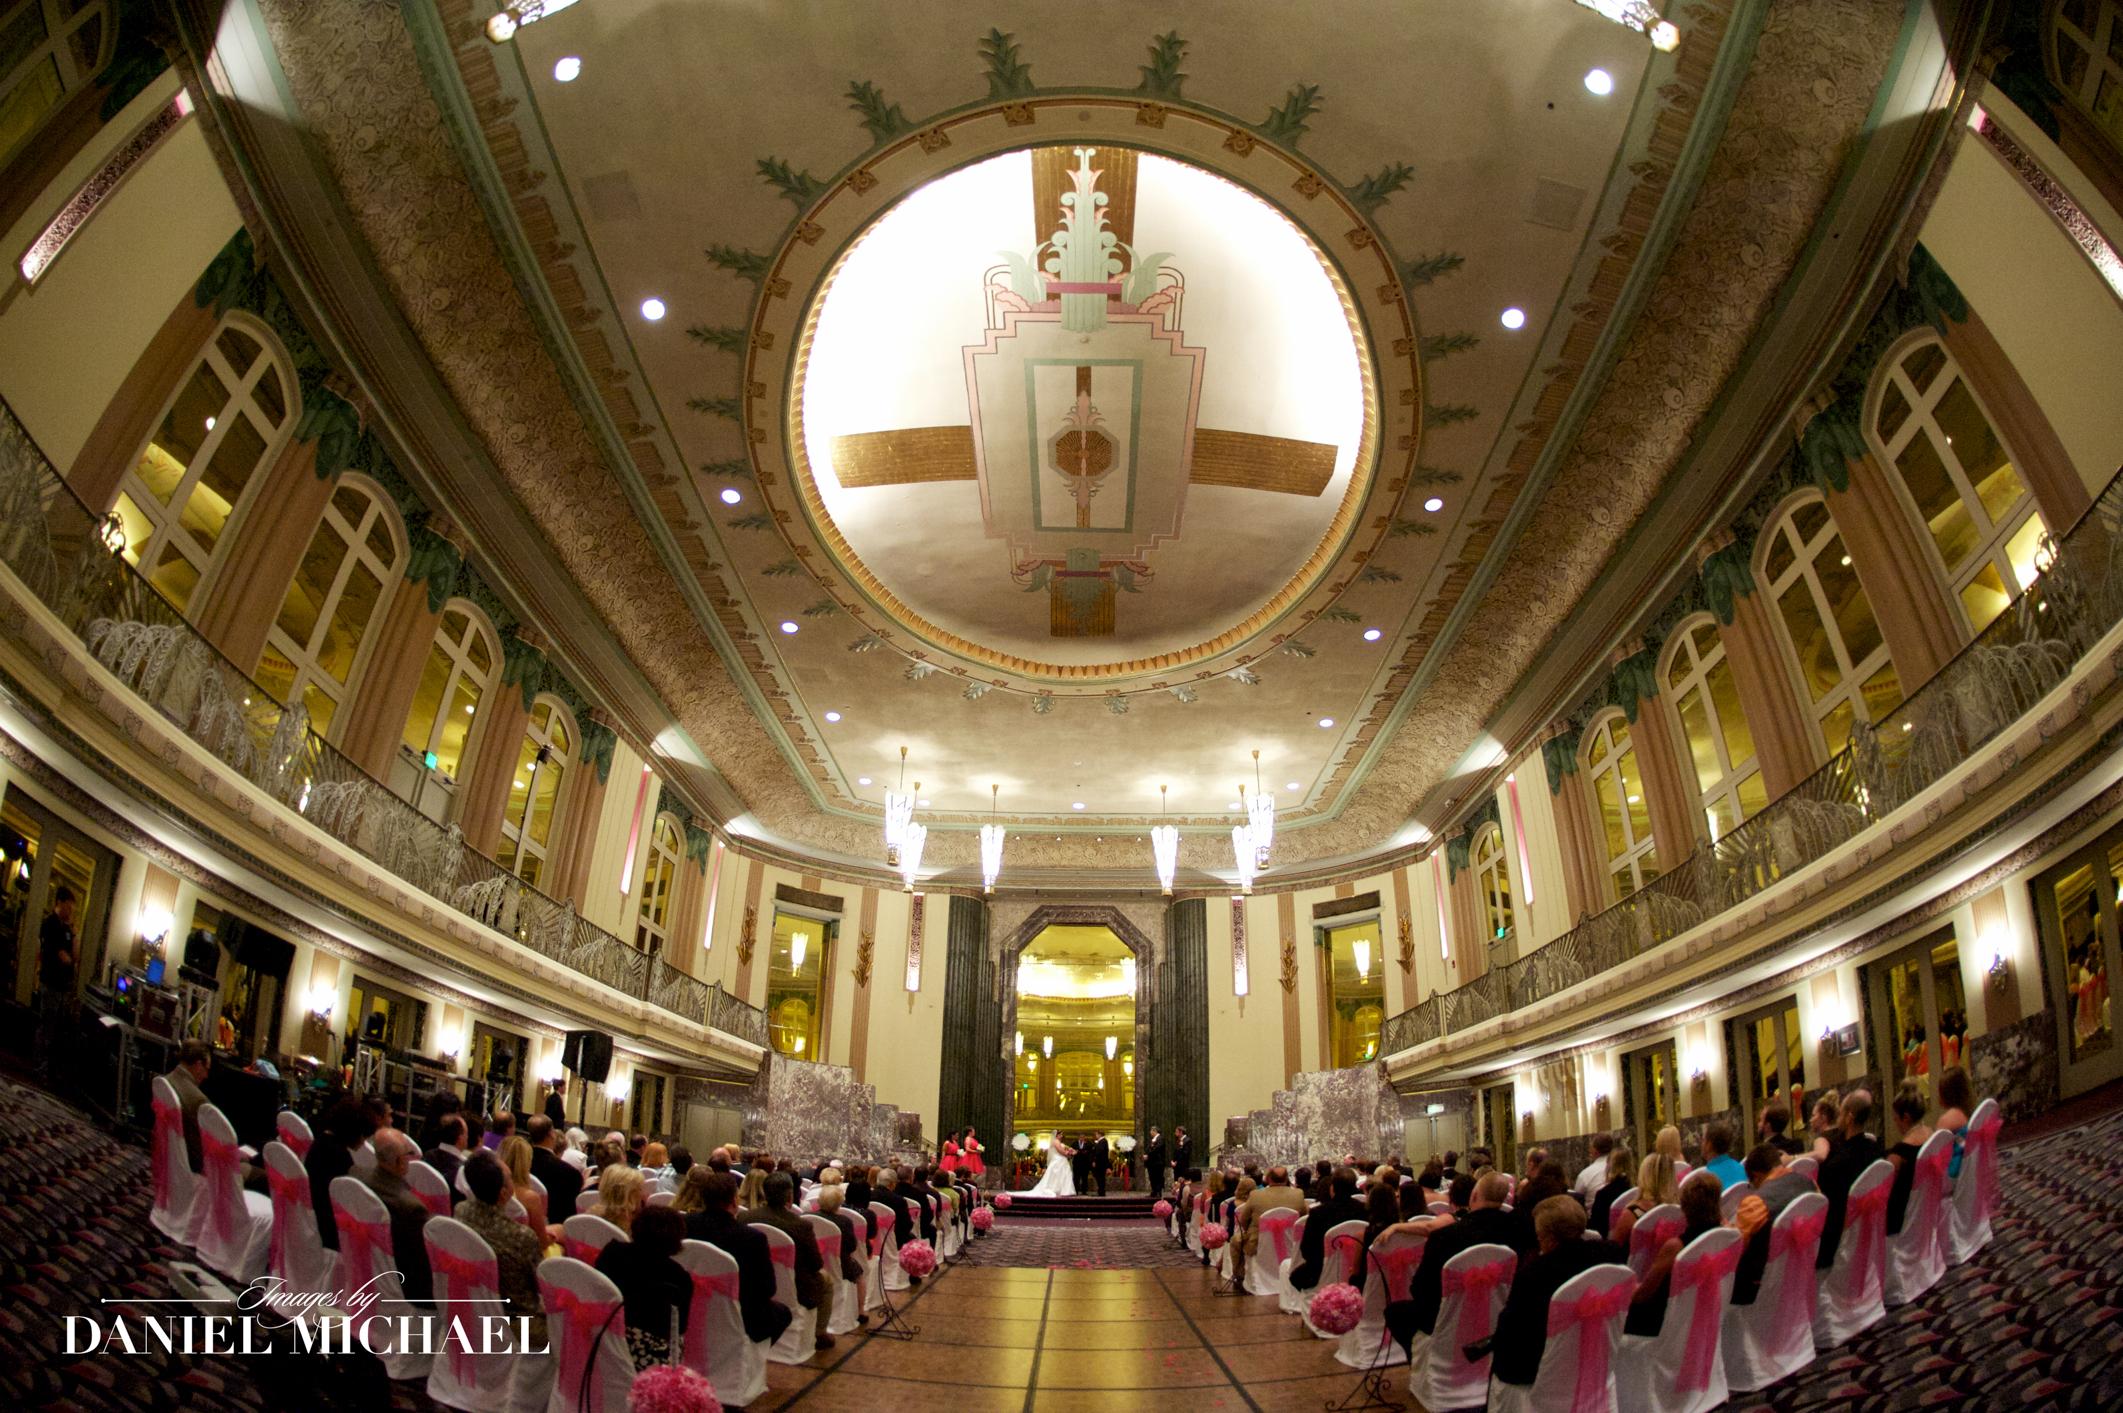 Hall of Mirrors Wedding Venue Ceremony Photography